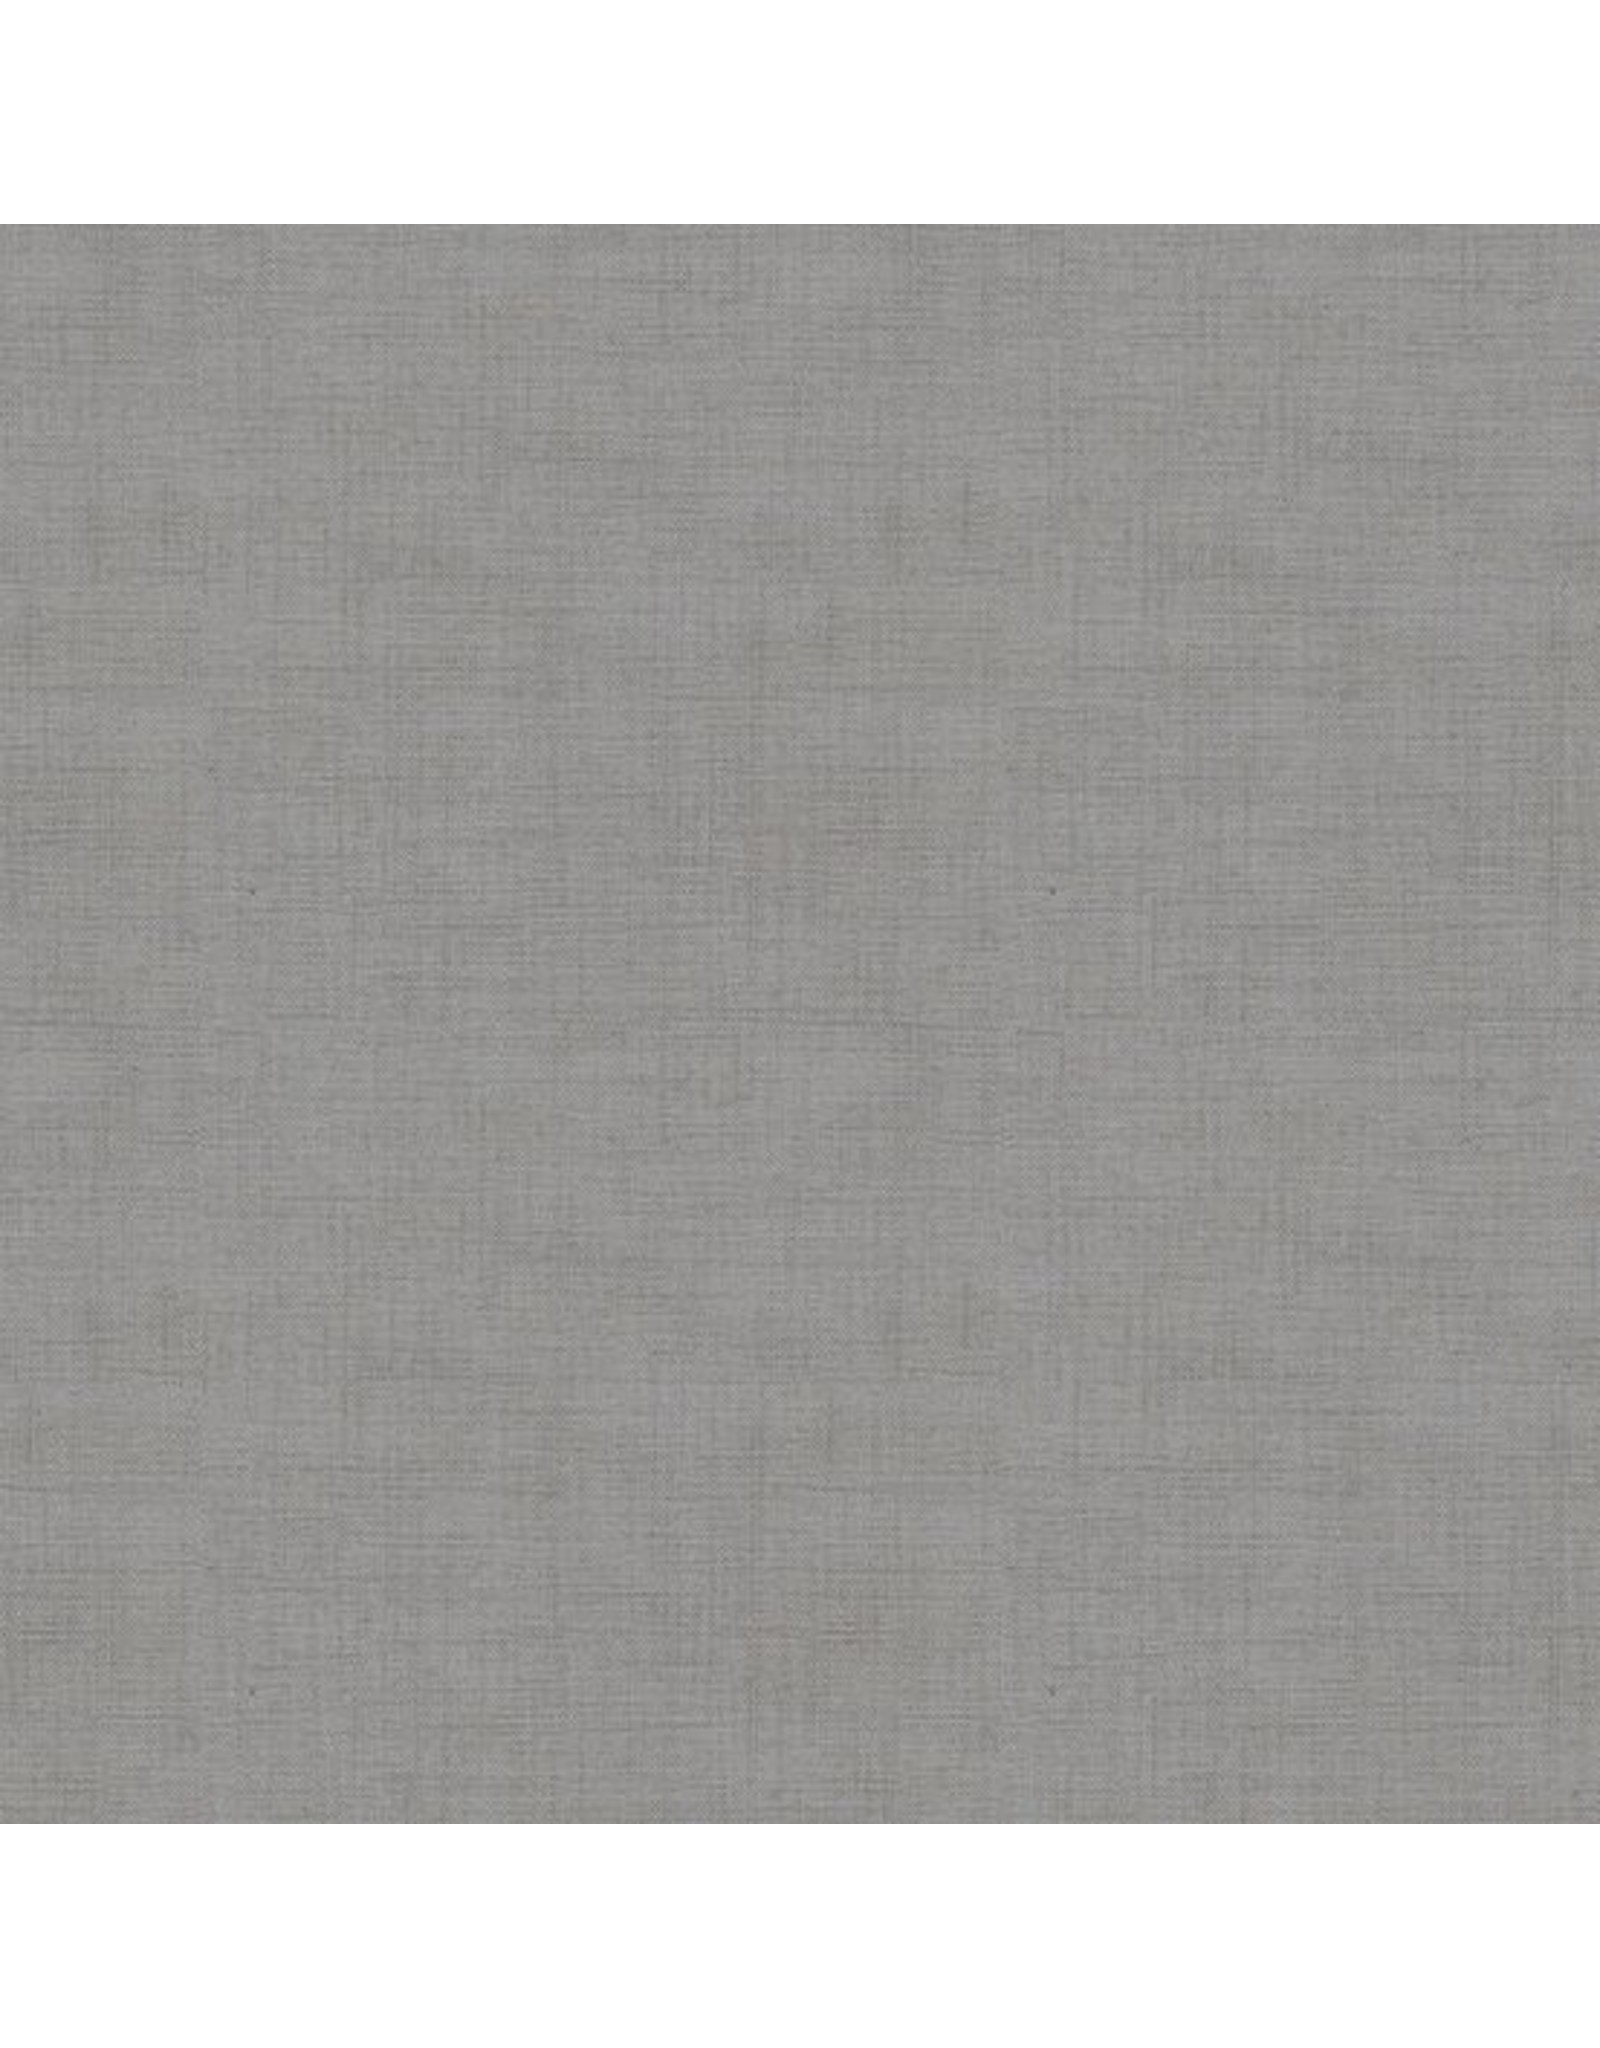 Makower UK Linen Texture - Steel Grey